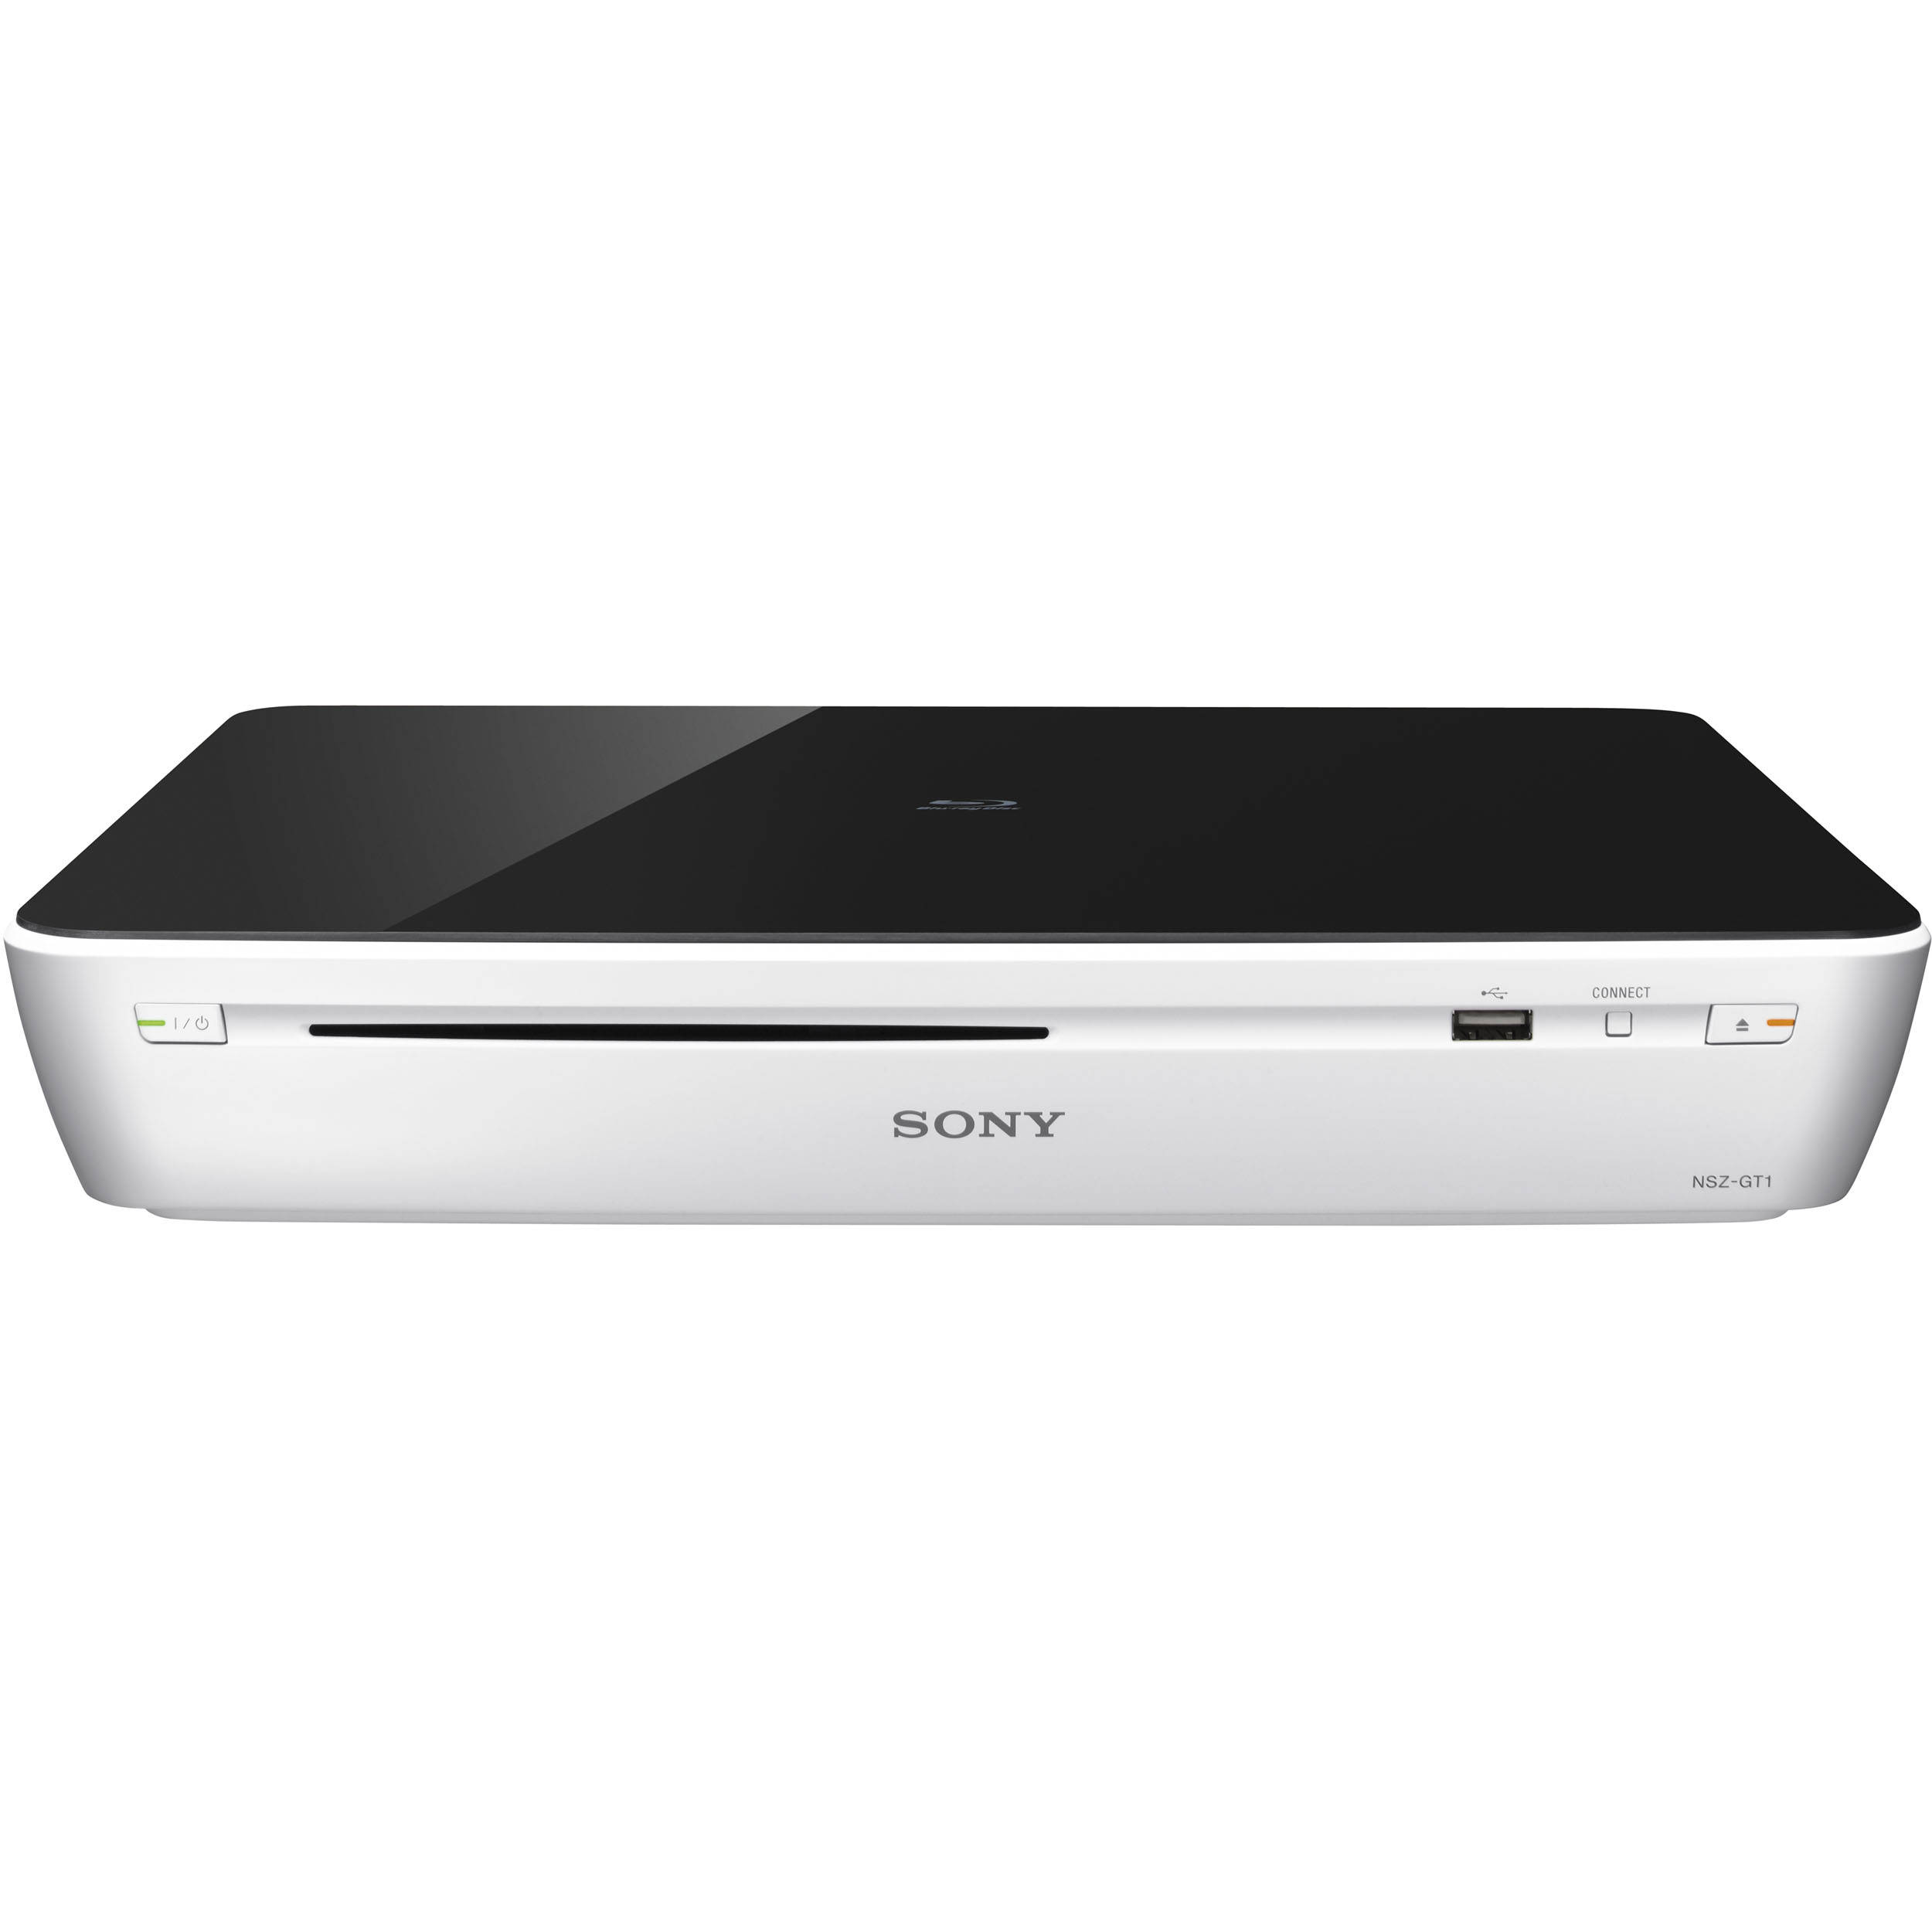 Sony Nszgt1 Internet Tv Blu Ray Disc Player Nszgt1 B H Photo